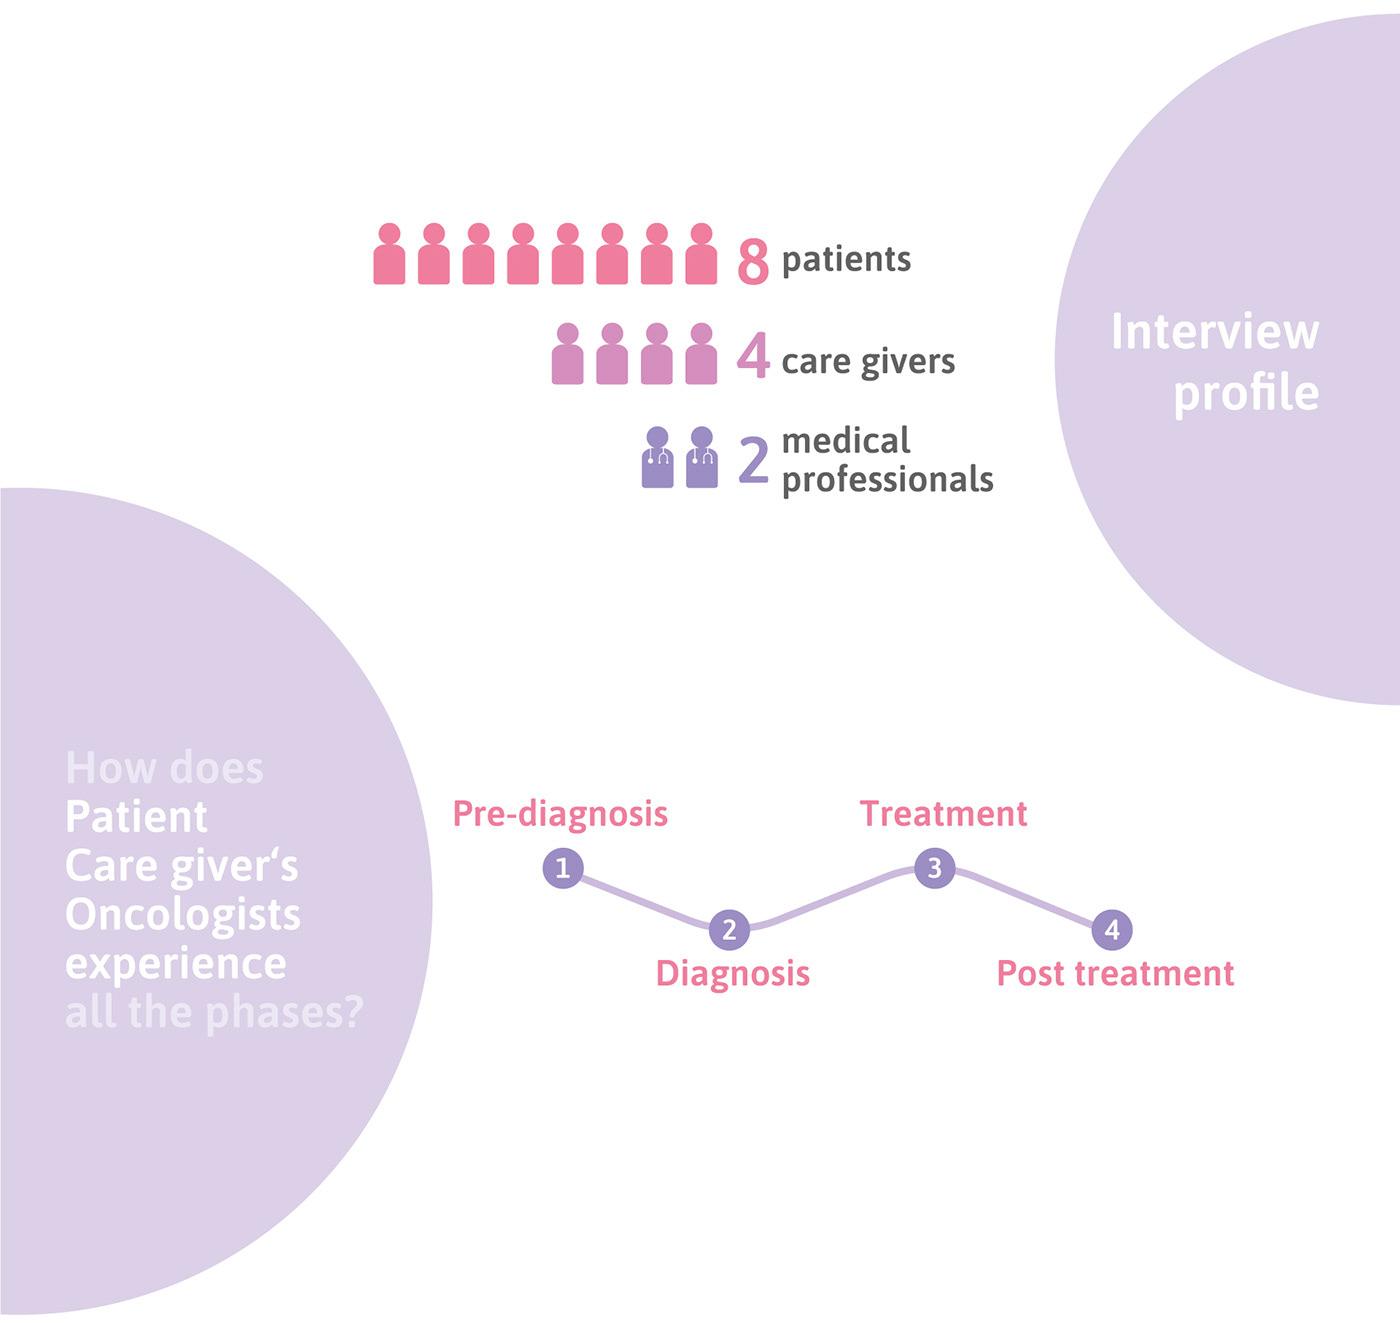 cancer care India system design Health hospitals patient Oncology nursing doctors